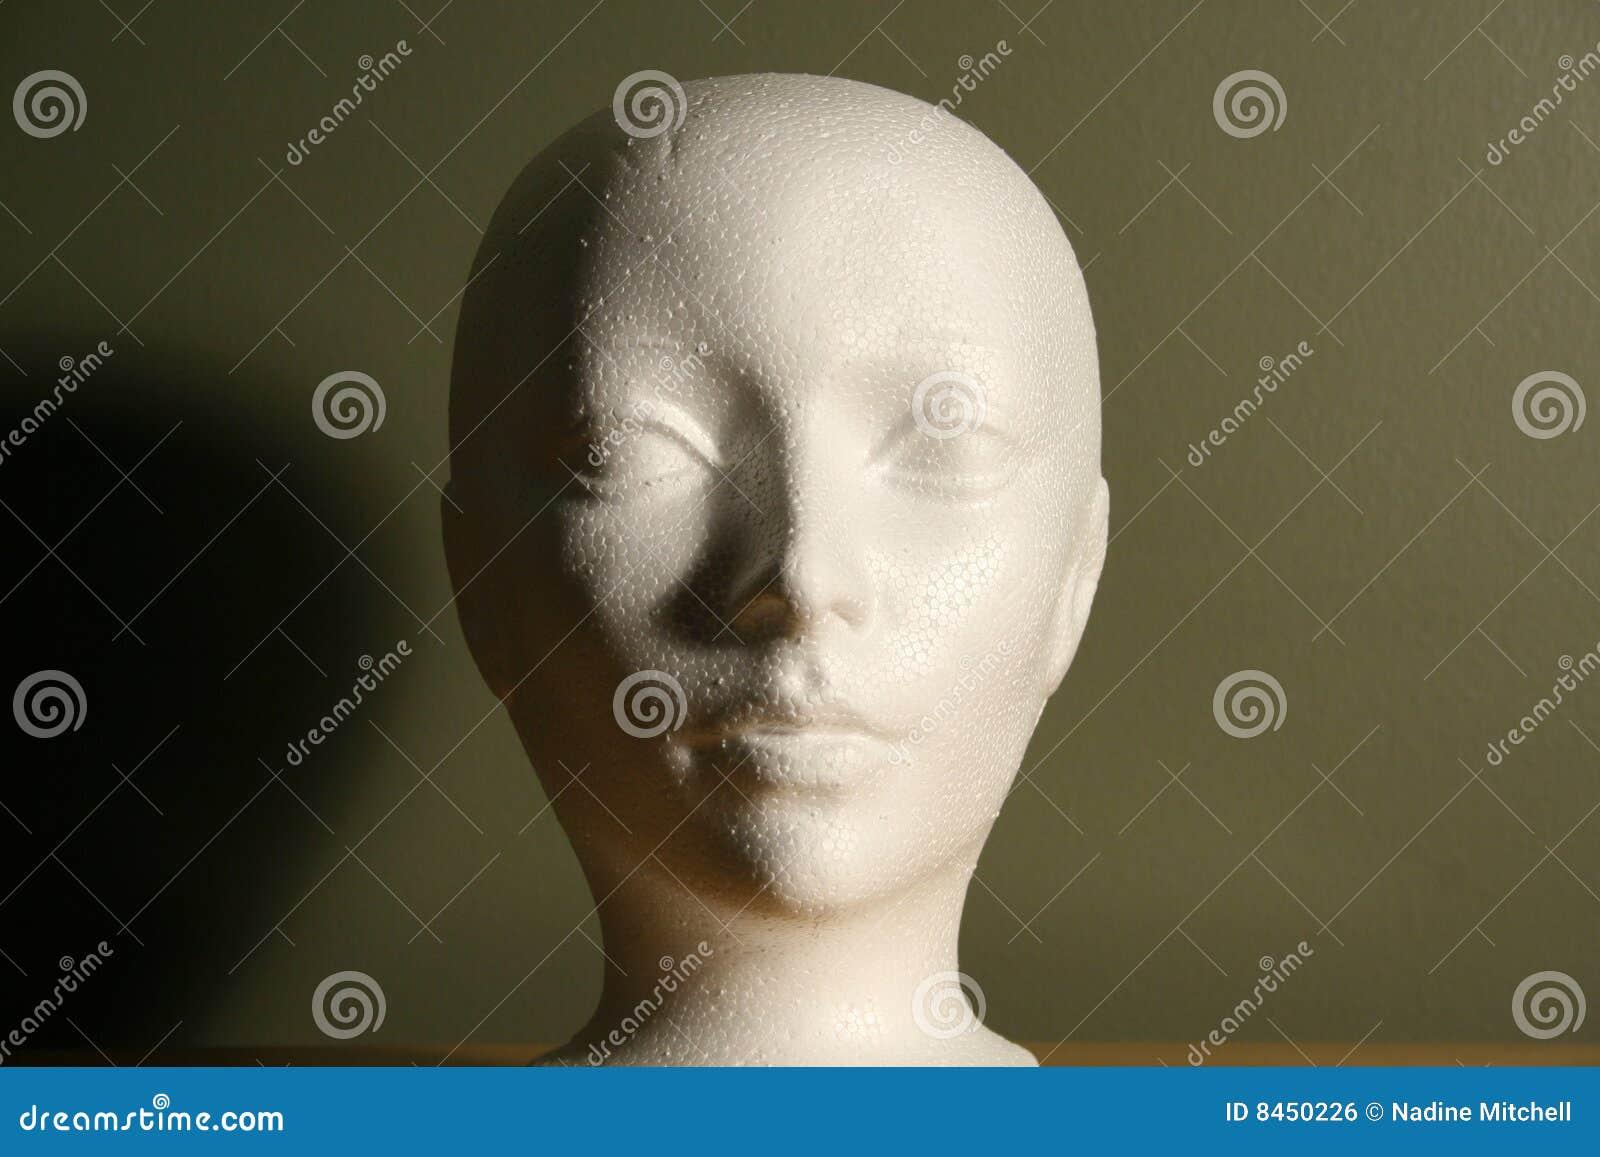 Head styrofoam